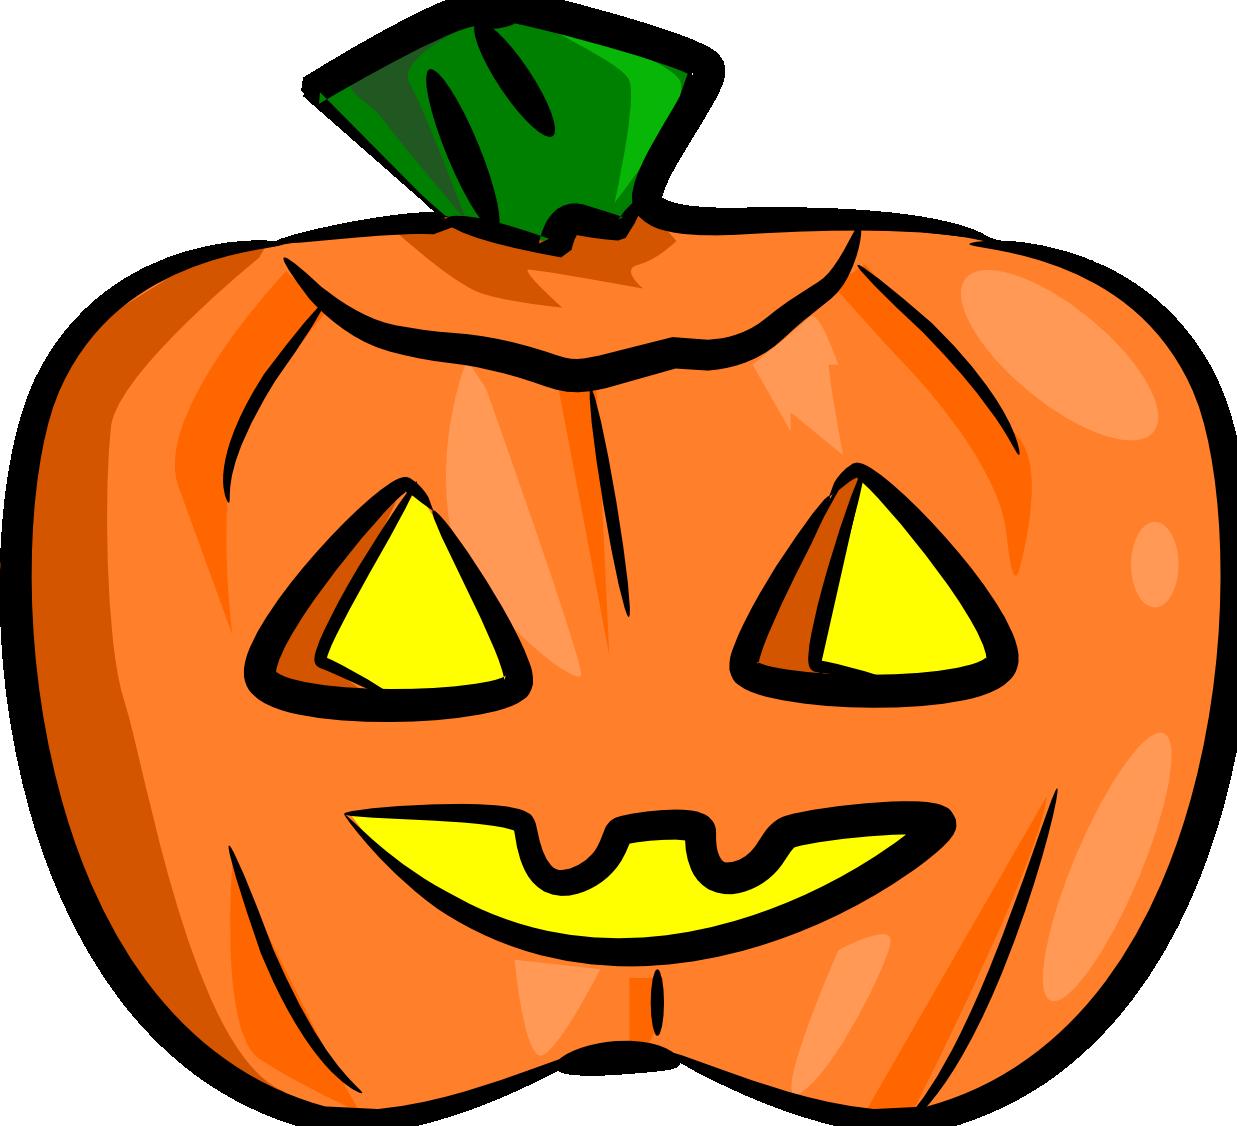 Jack-o'-lantern clipart #13, Download drawings